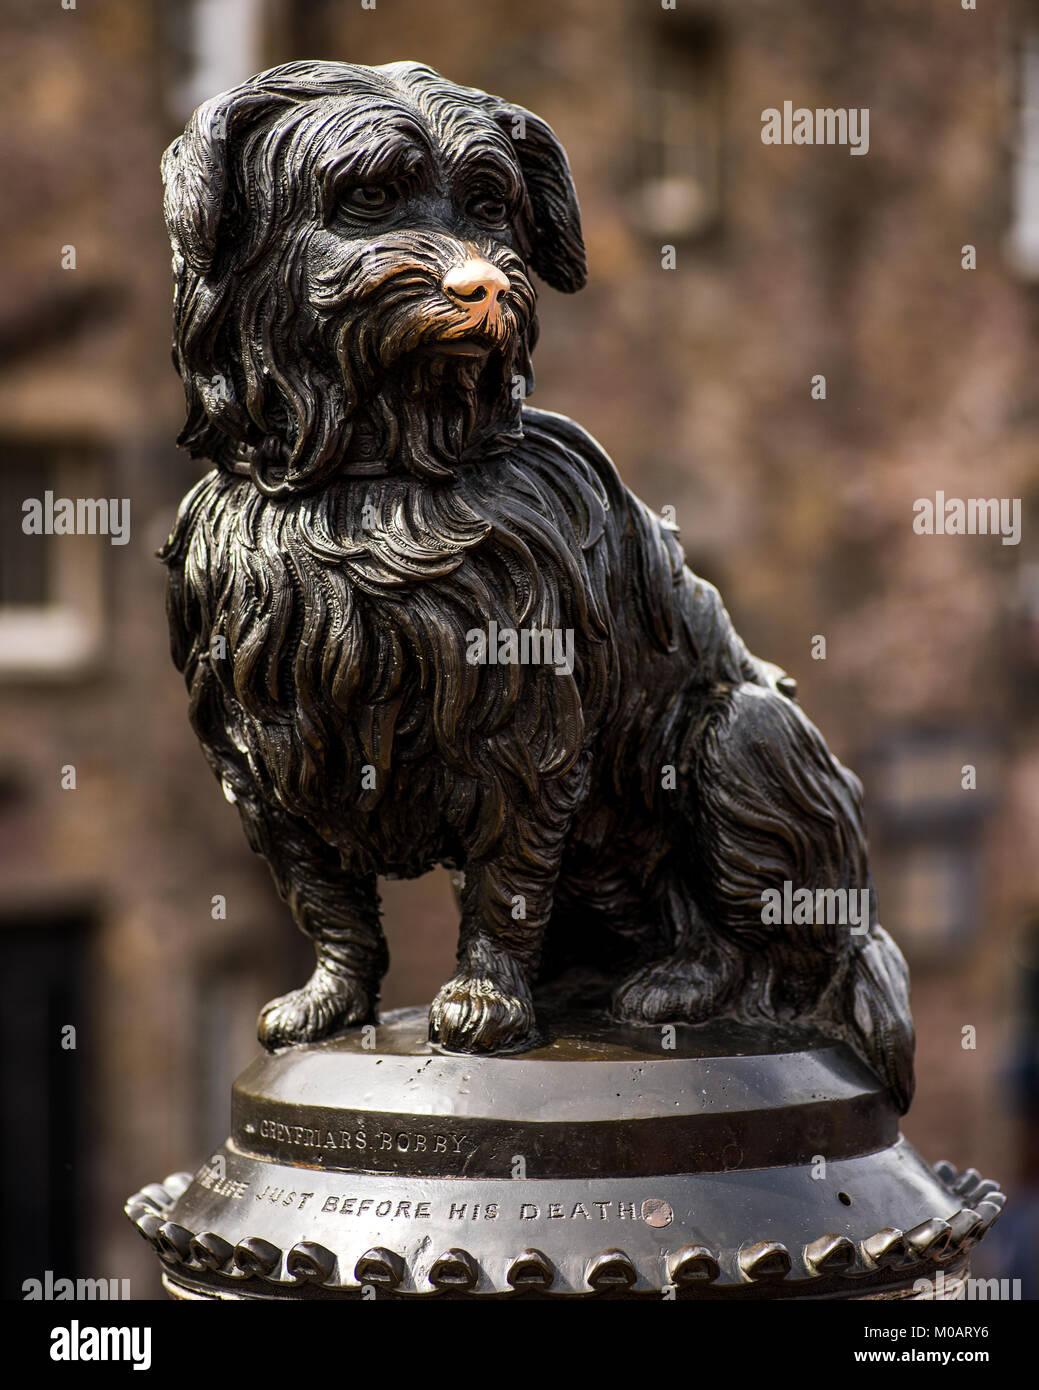 Statue of Greyfriars Bobby in Edinburgh, Scotland (UK) Stock Photo